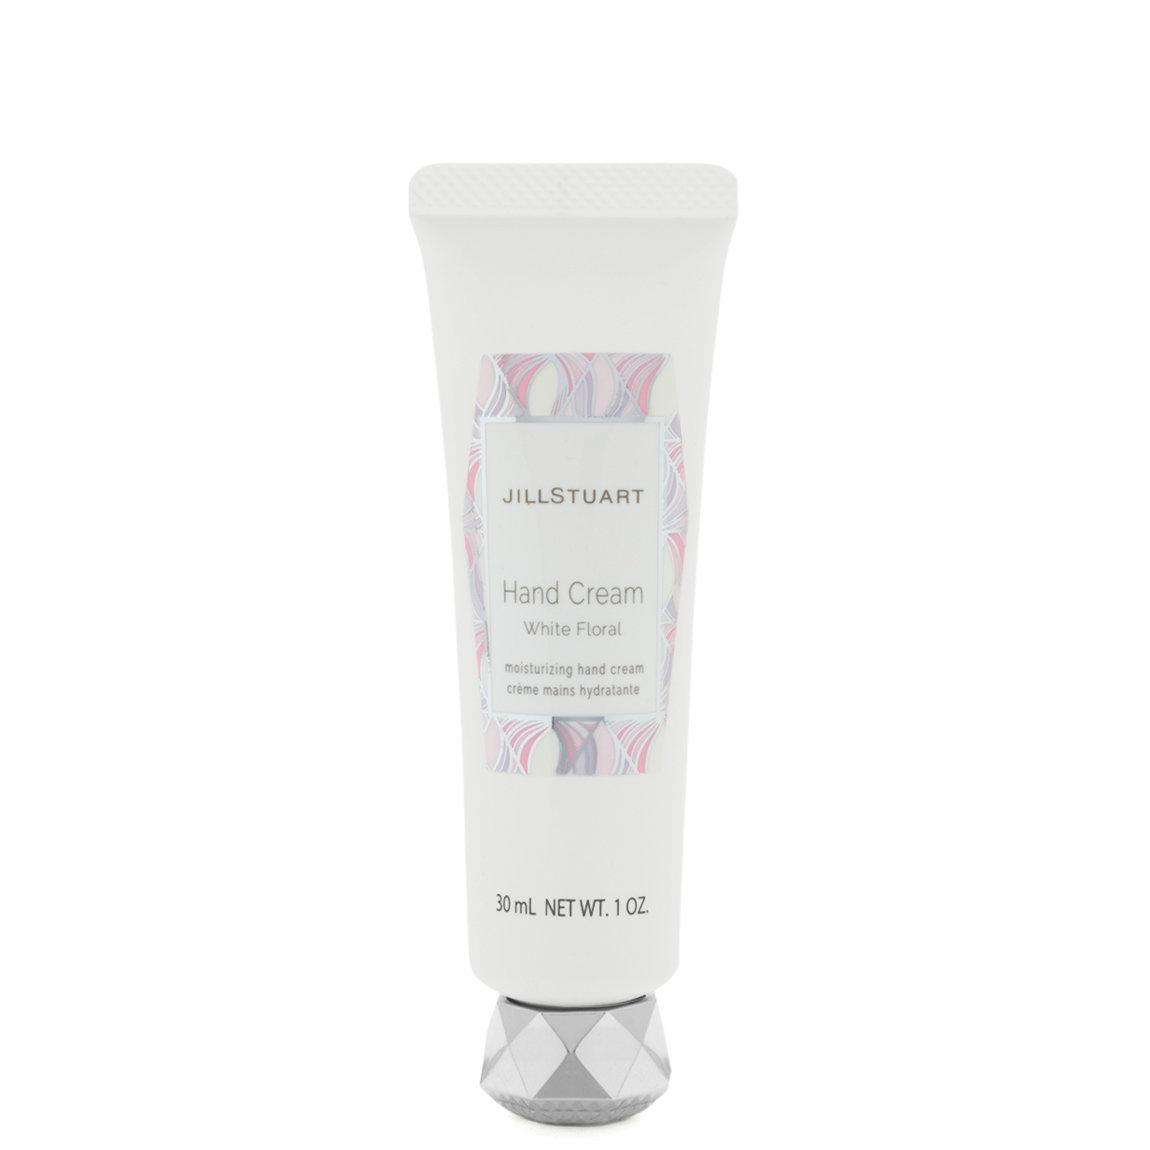 JILL STUART Beauty Hand Cream - White Floral 30 g alternative view 1 - product swatch.